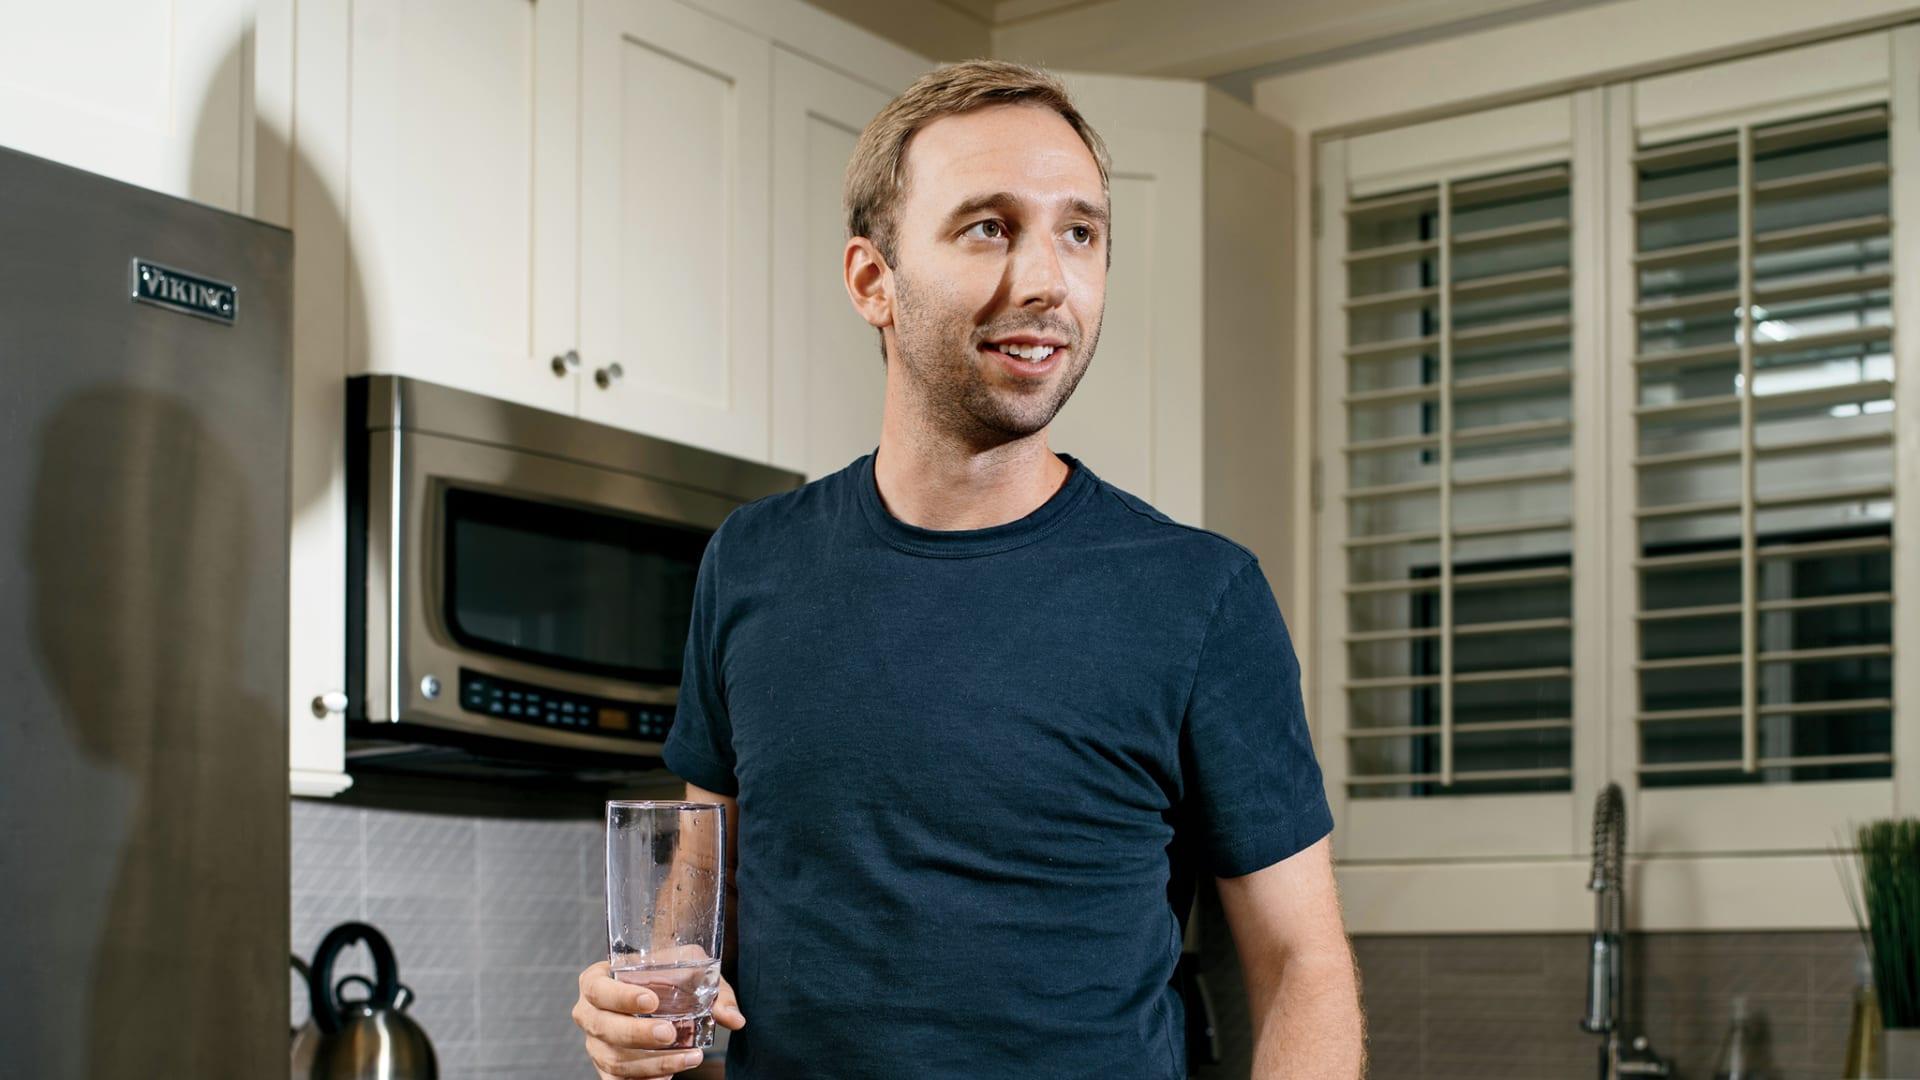 Patrick Vihtelic, founder of Home Chef.